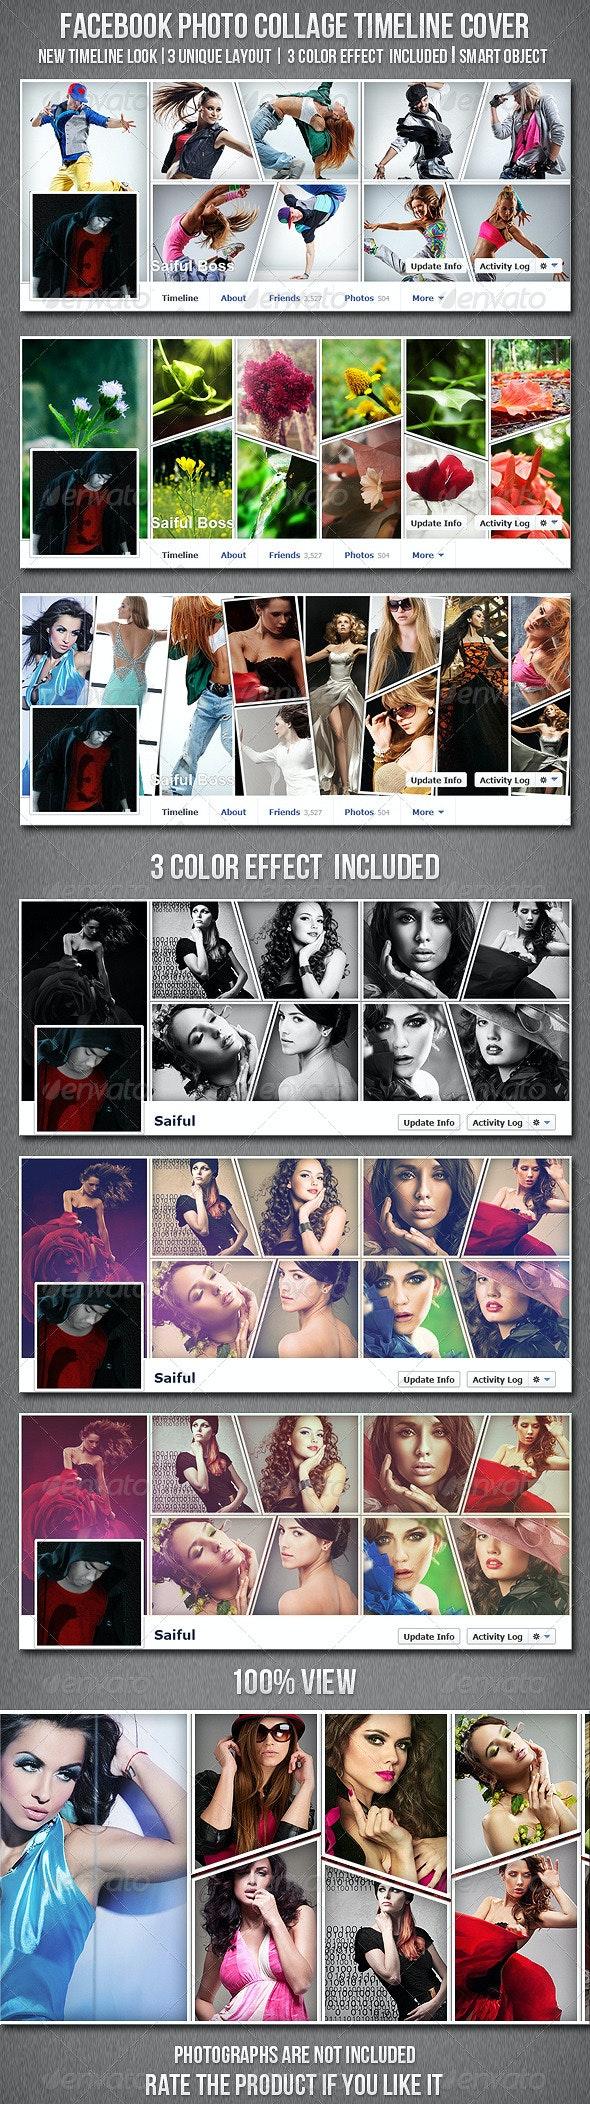 Facebook Photo Collage Timeline Cover - Facebook Timeline Covers Social Media